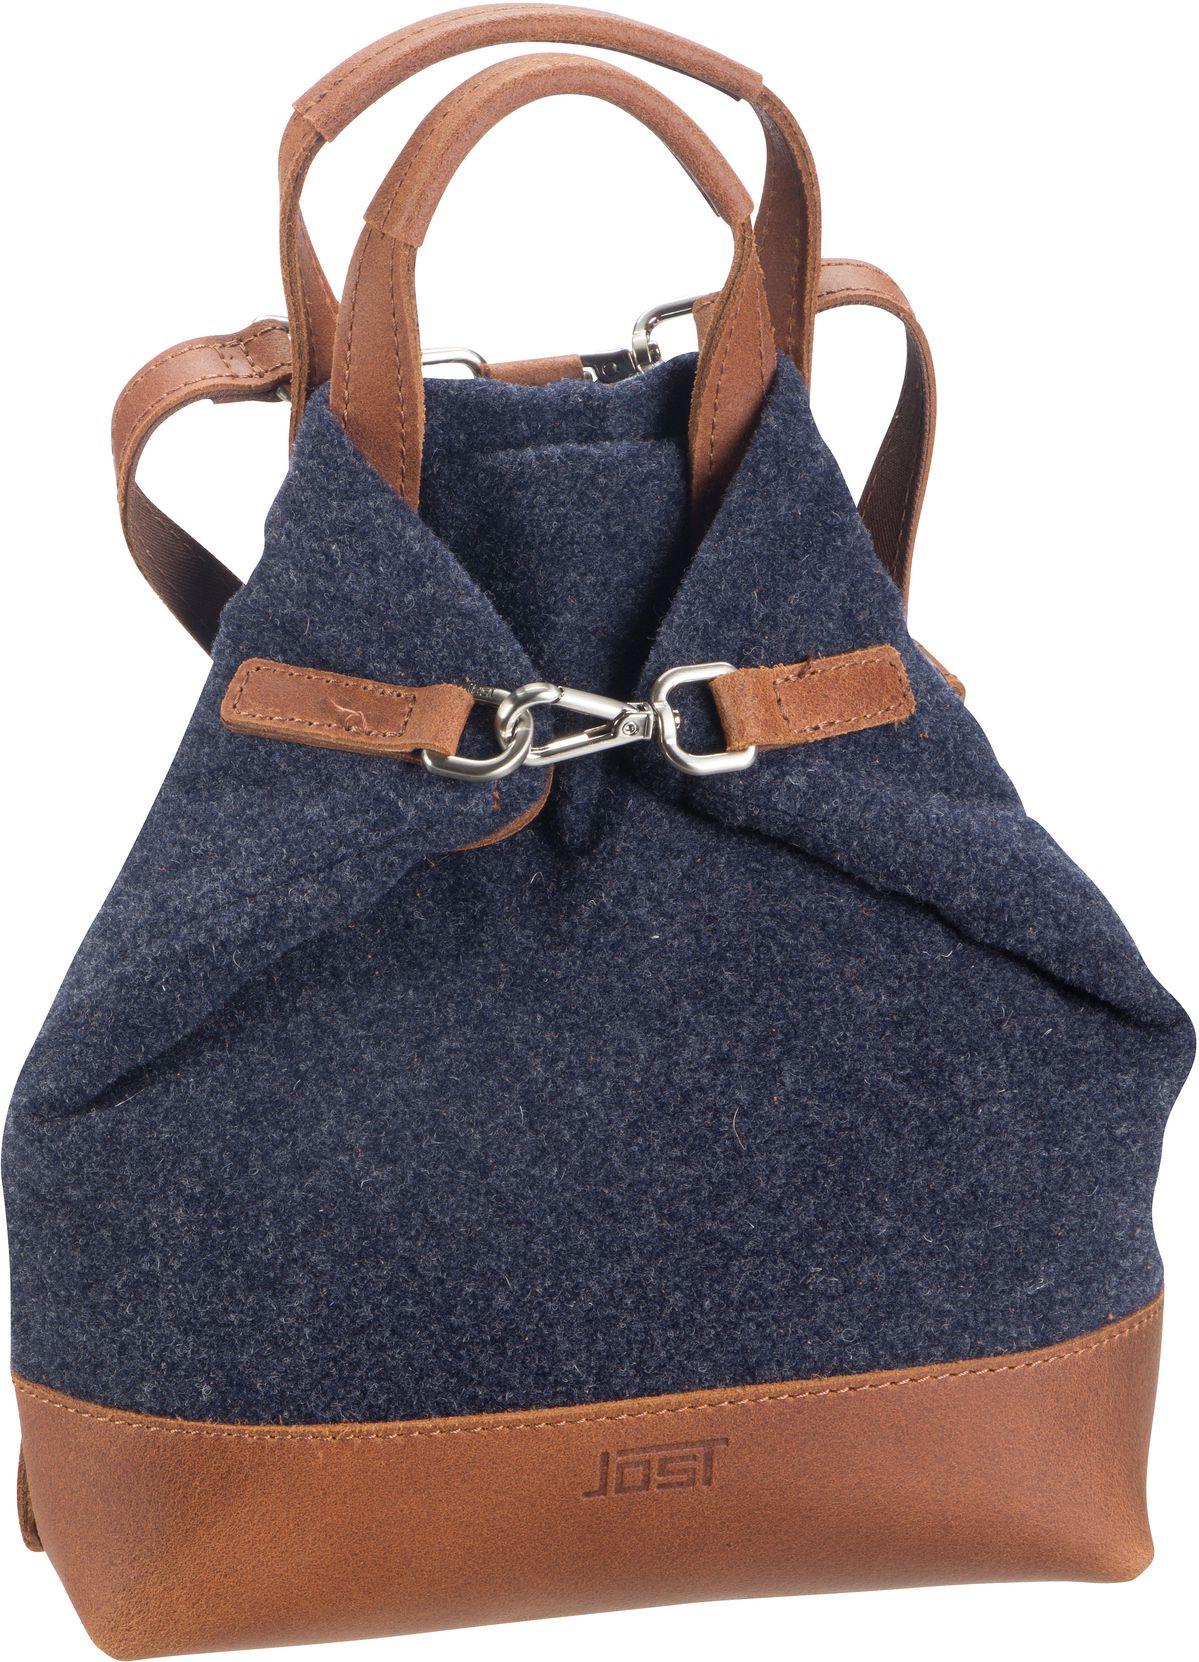 Rucksack / Daypack Farum 3024 X-Change Bag Mini Navy